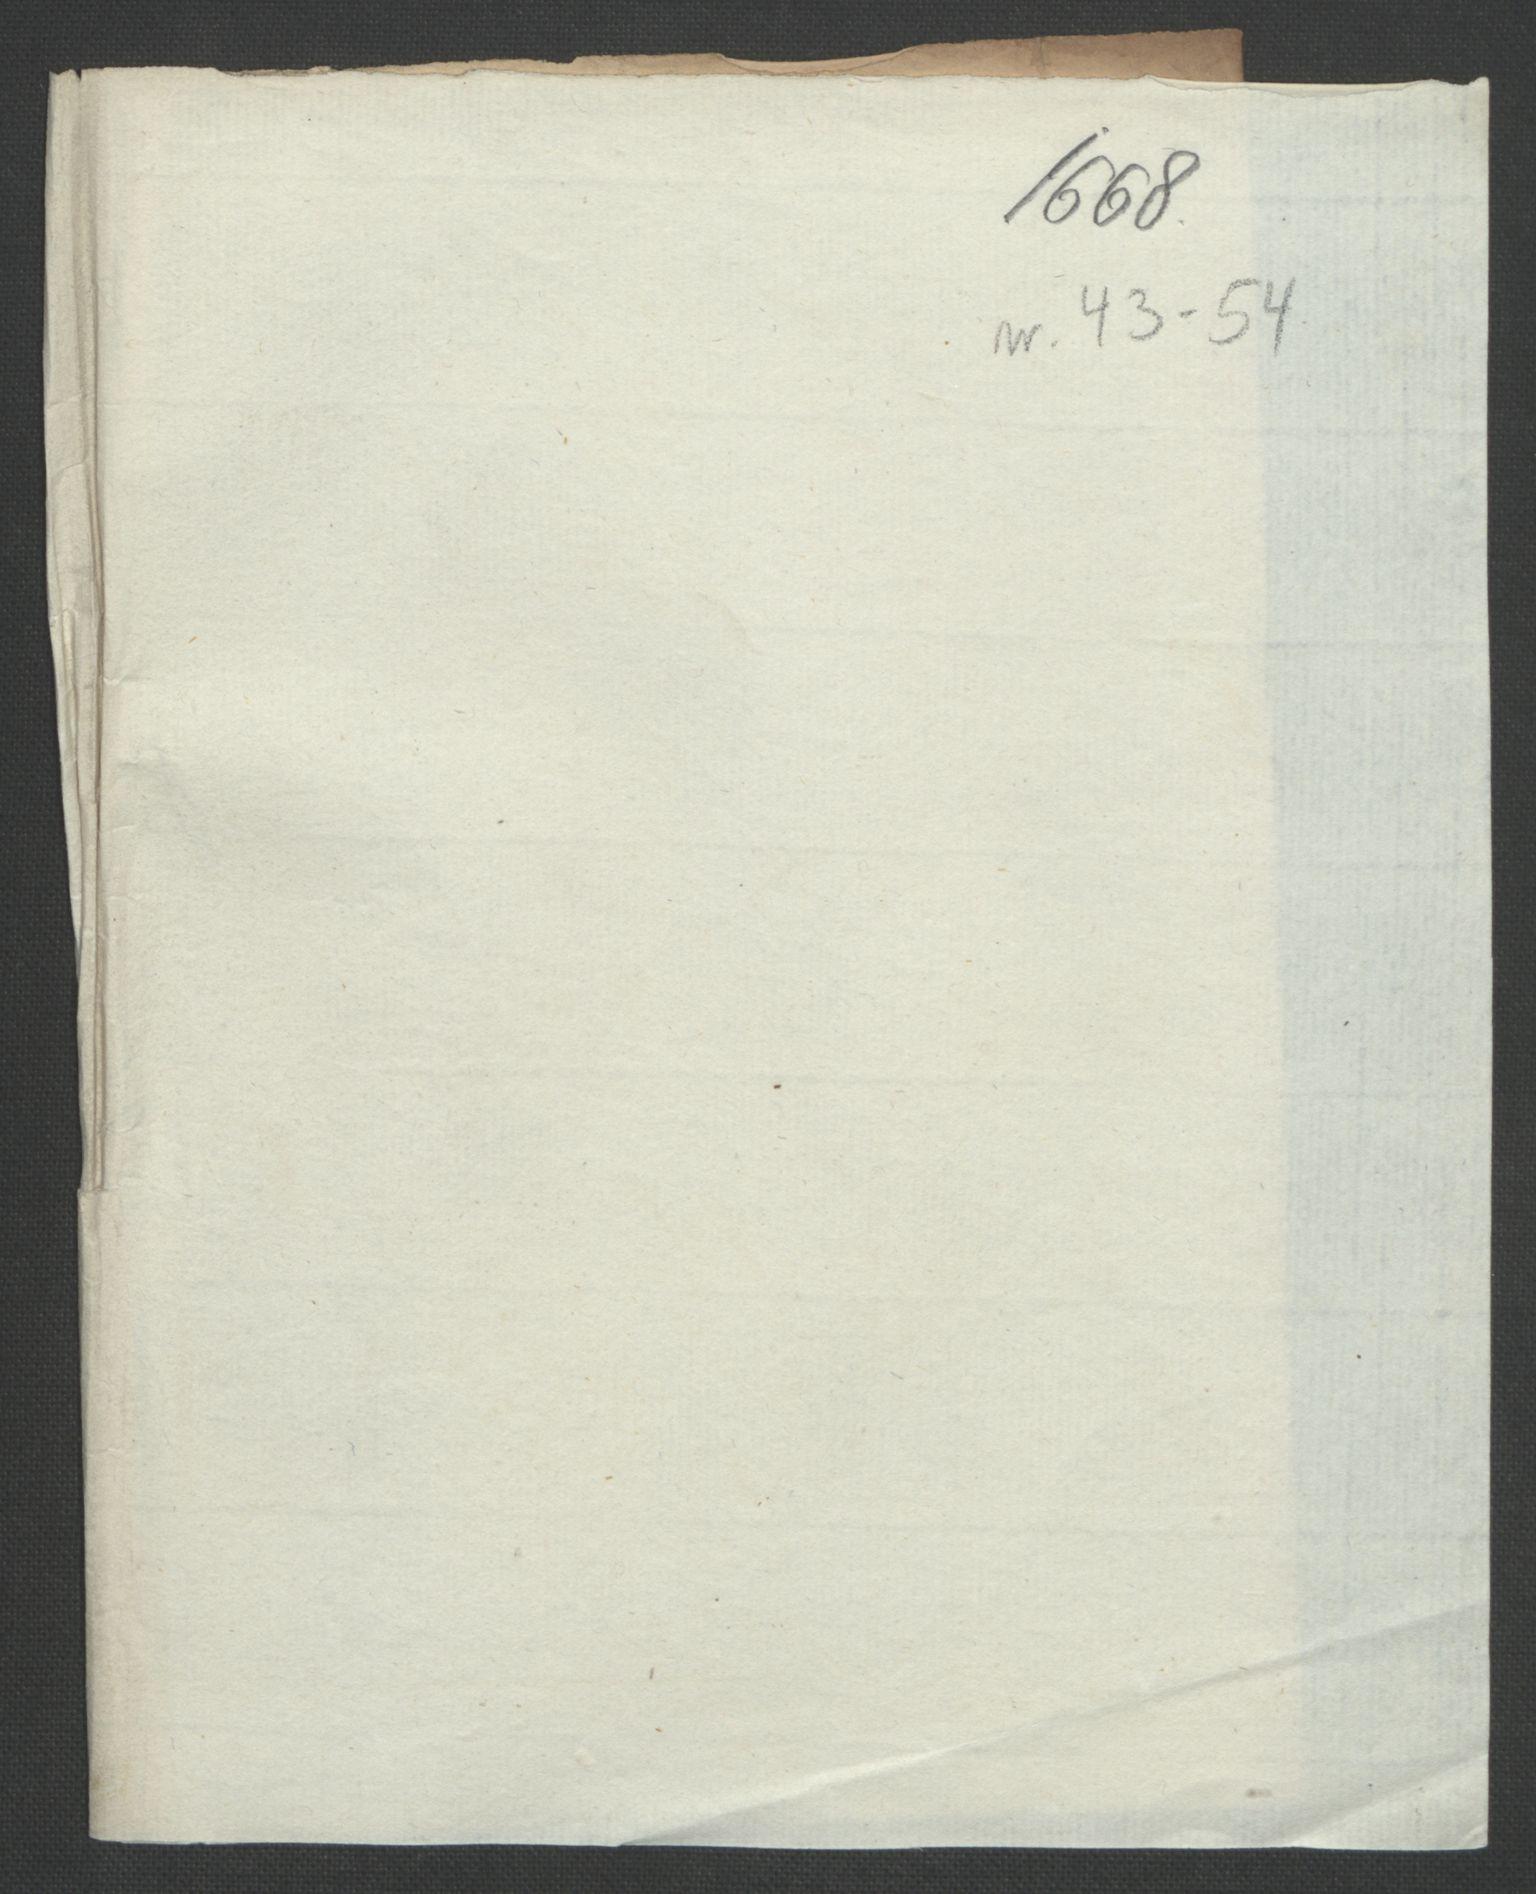 RA, Rentekammeret inntil 1814, Reviderte regnskaper, Fogderegnskap, R32/L1842: Fogderegnskap Jarlsberg grevskap, 1664-1673, s. 107